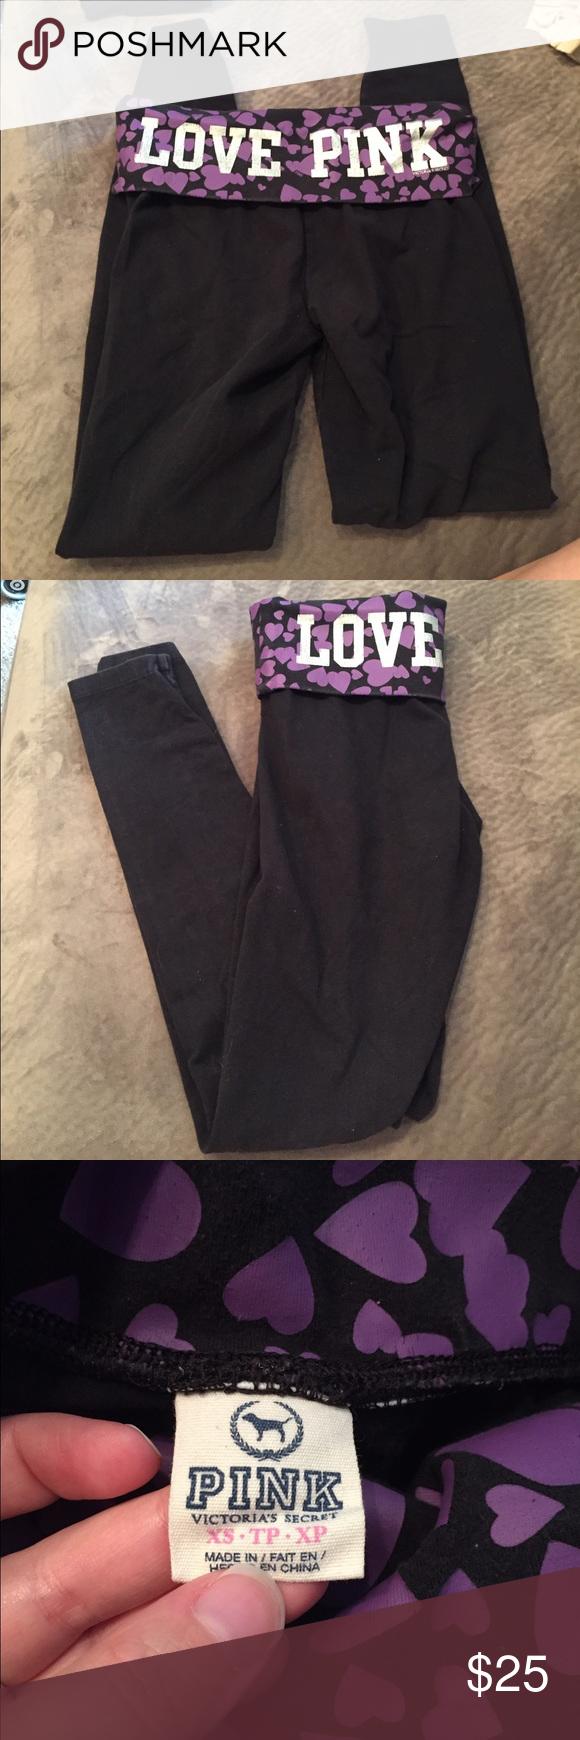 VS PINK yoga leggings Size XS good condition. Cheaper on Ⓜ️ PINK Victoria's Secret Pants Leggings